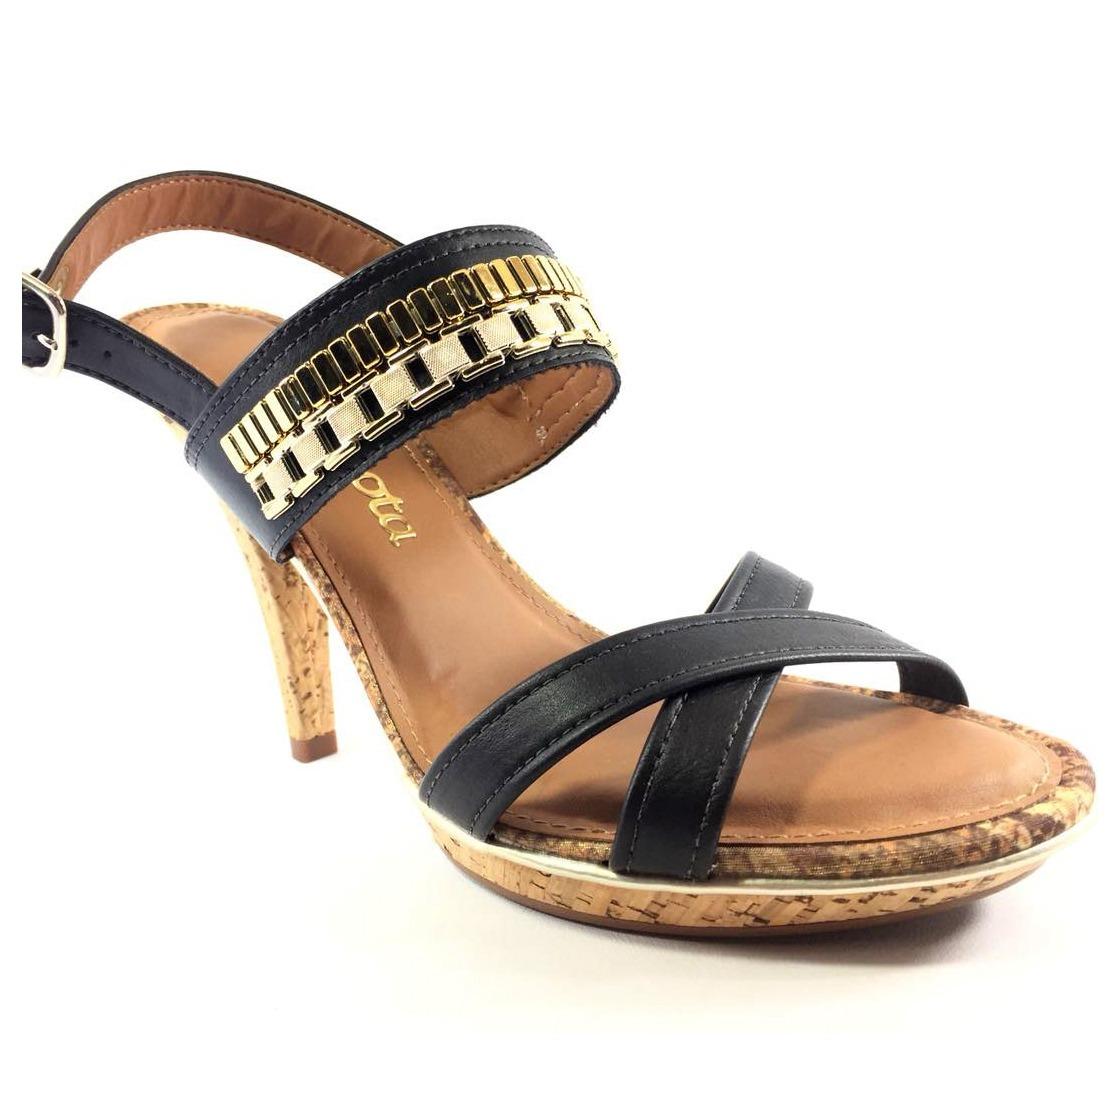 fe7d9183b7 sandália dakota meia pata salto fino feminina - preto. Carregando zoom.